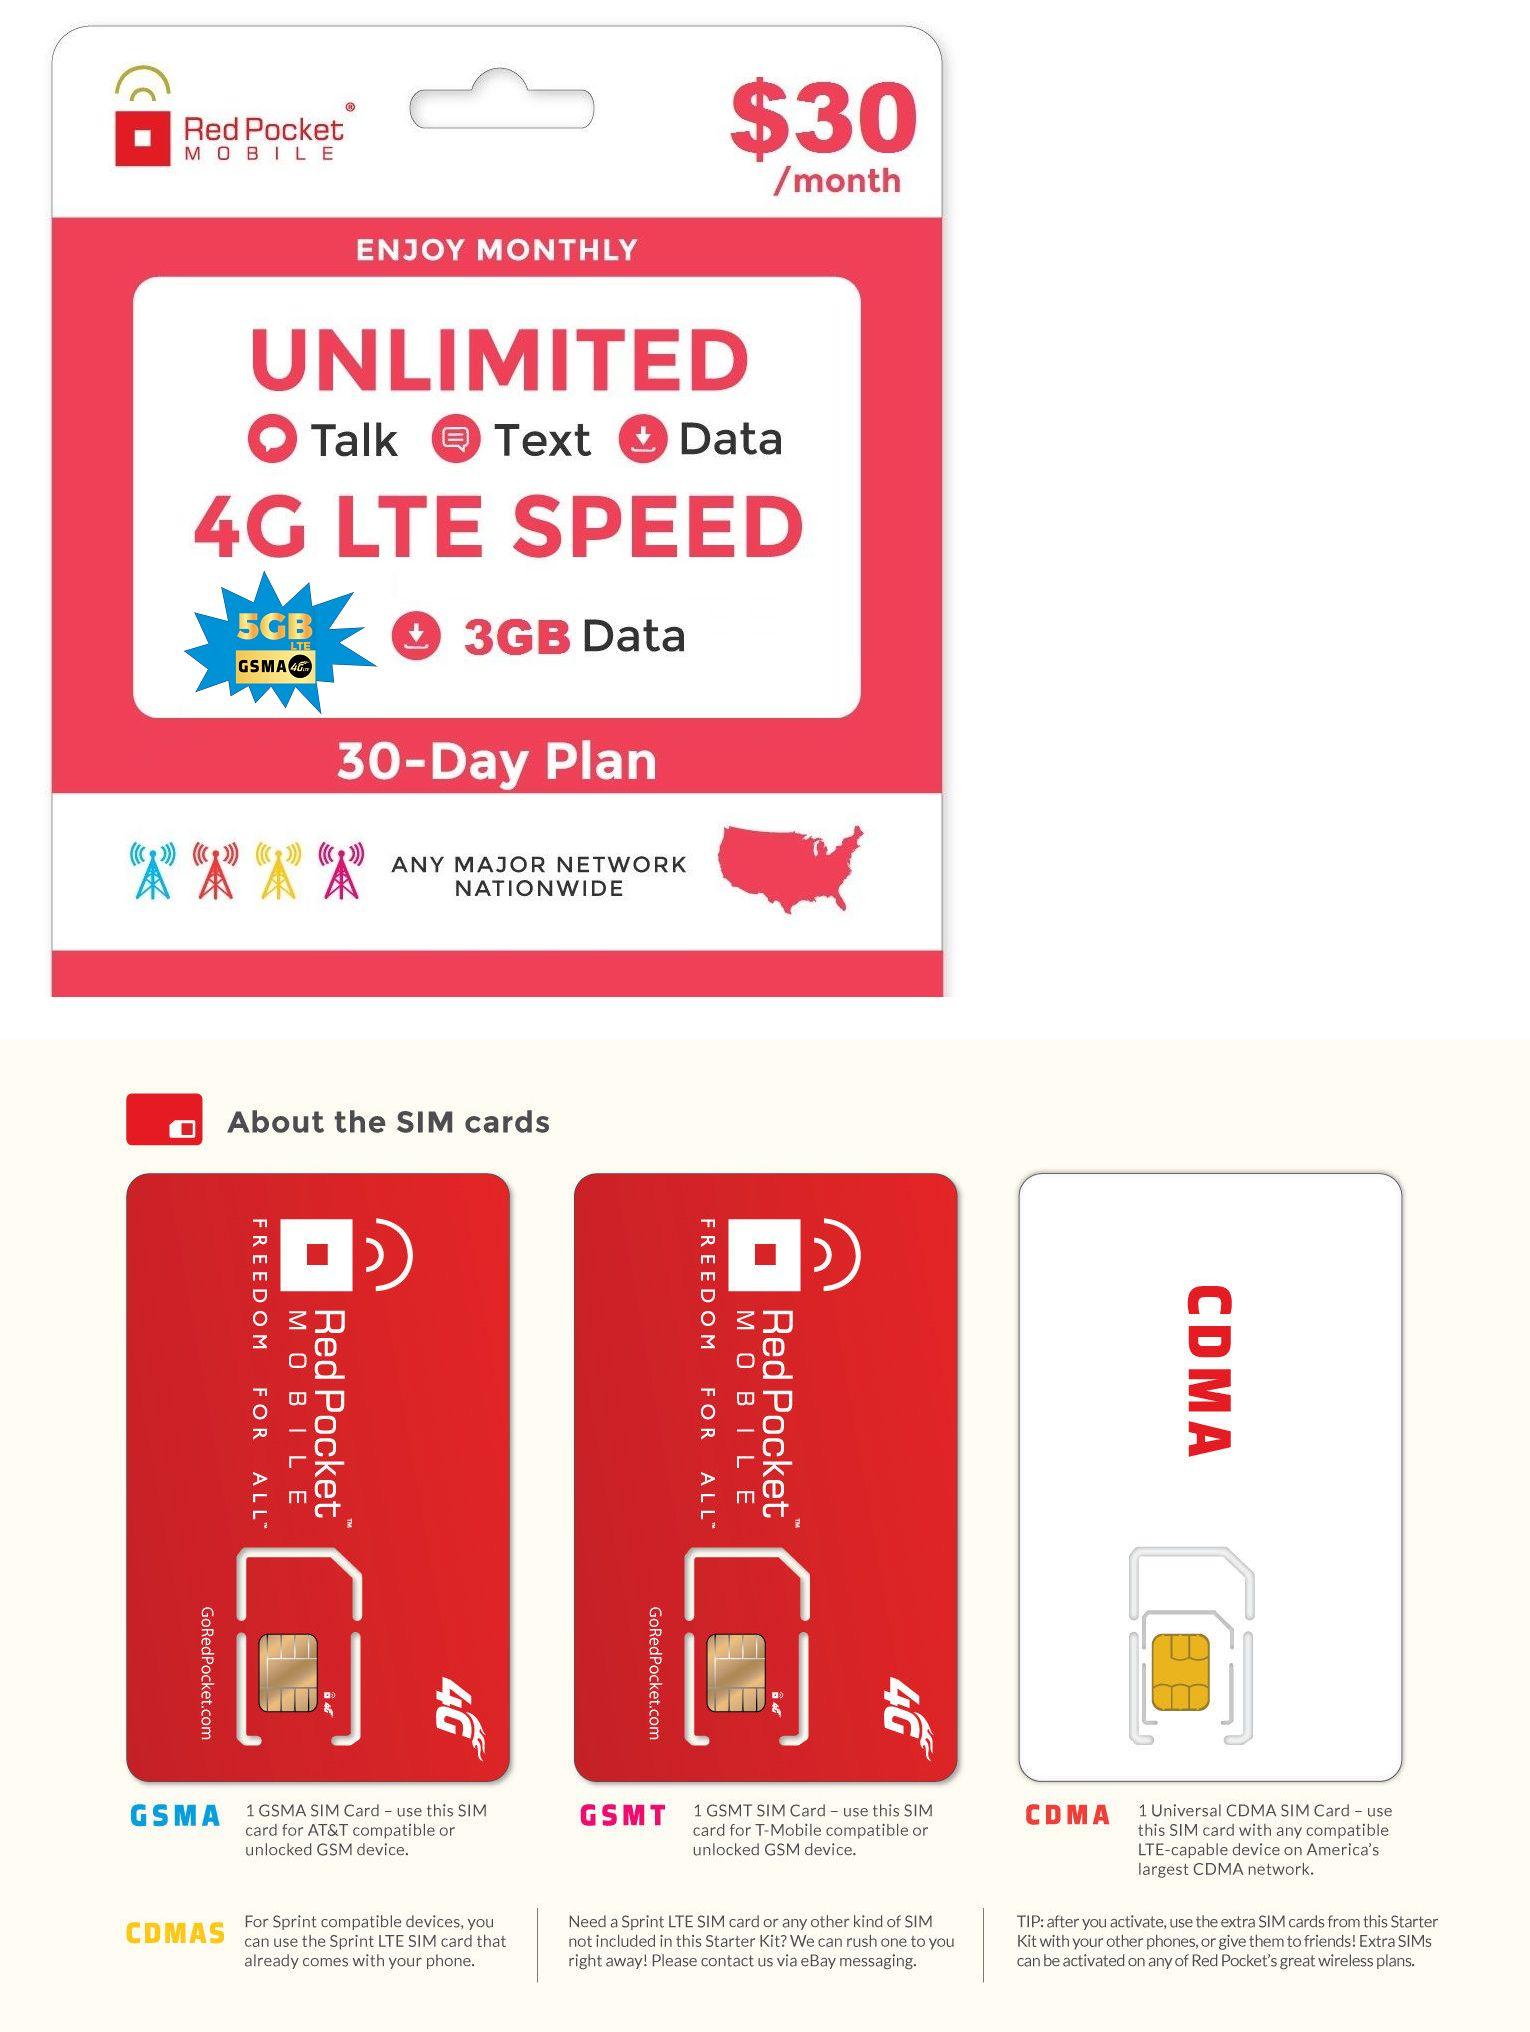 30mo red pocket prepaid wireless phone plansim